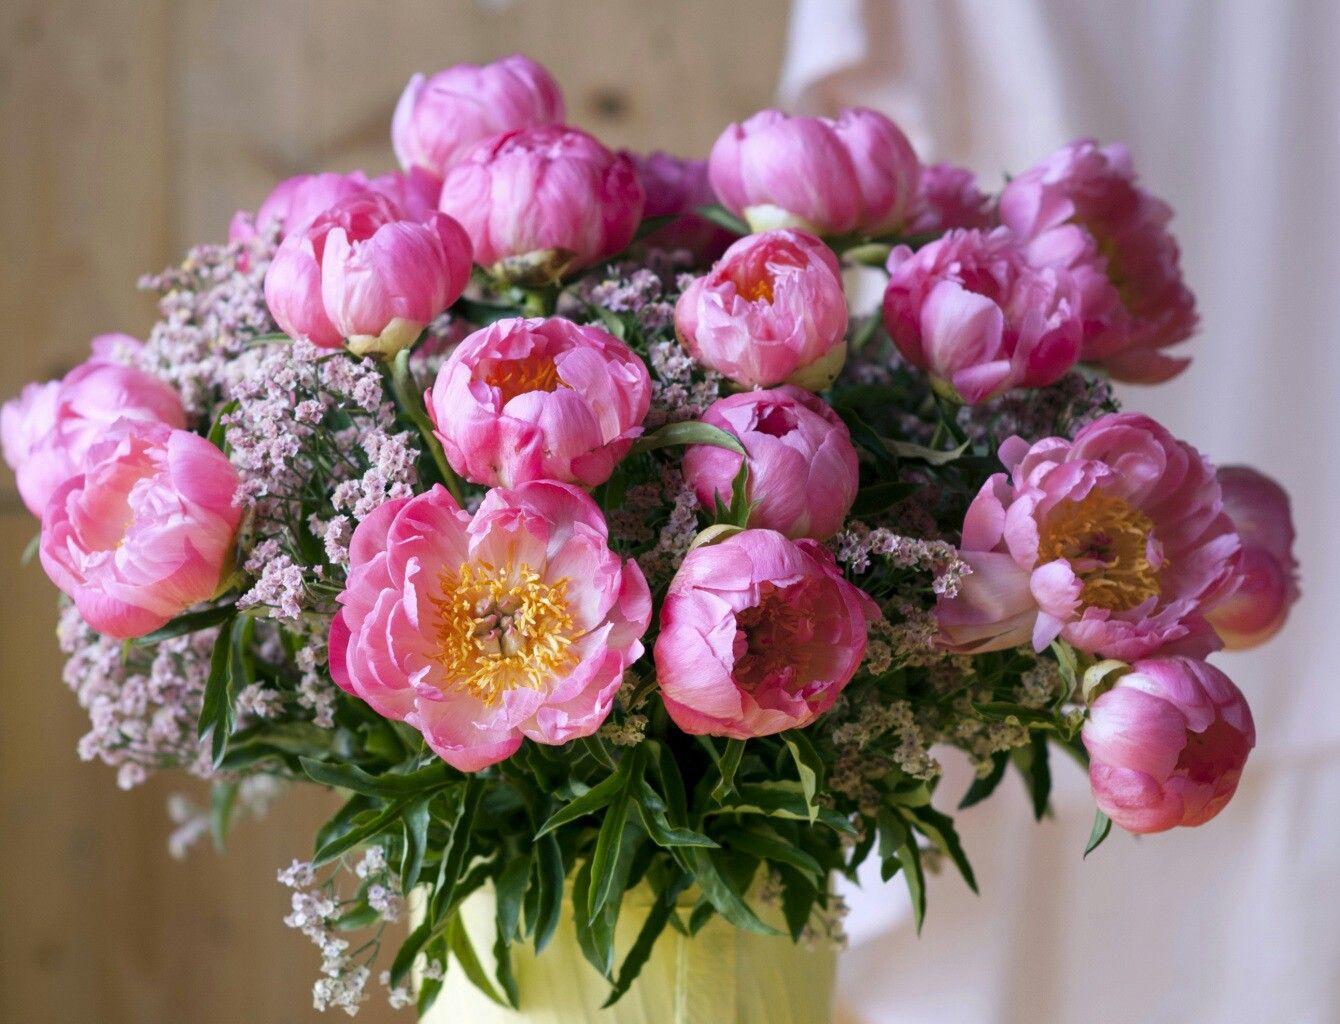 Peonies Closeup Pink Color Flowers Roses Flowers Pinterest